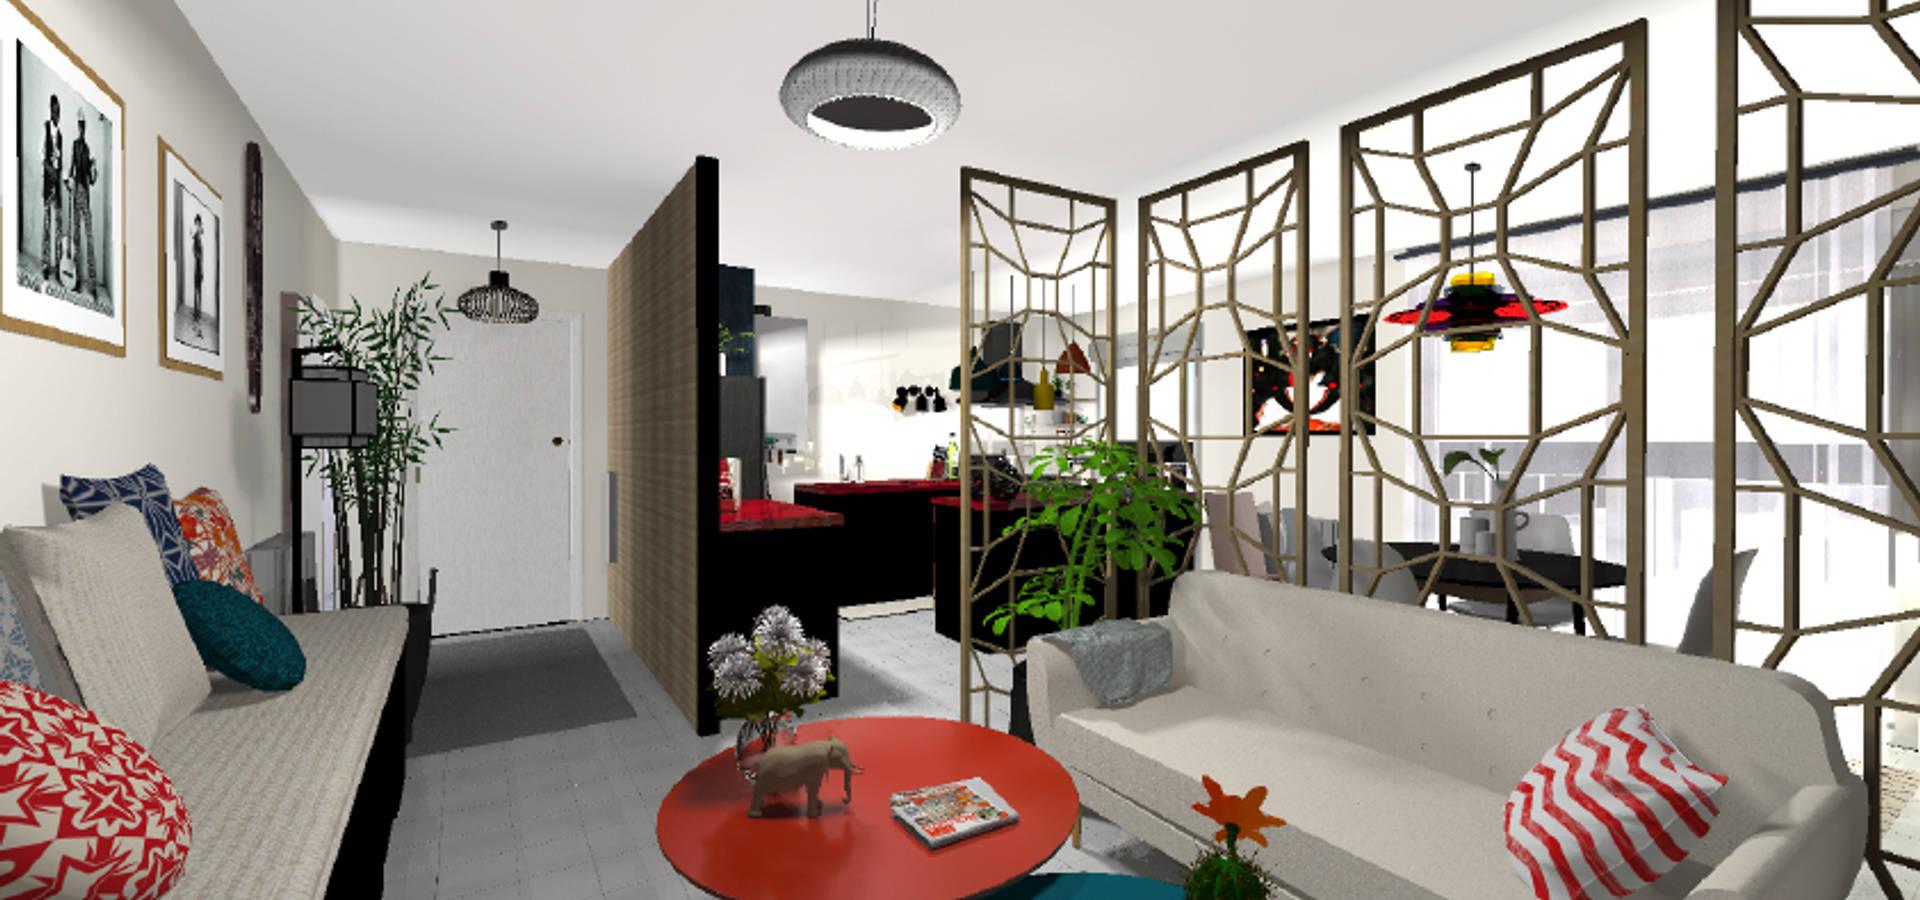 Sonia HADDON Interior Designer